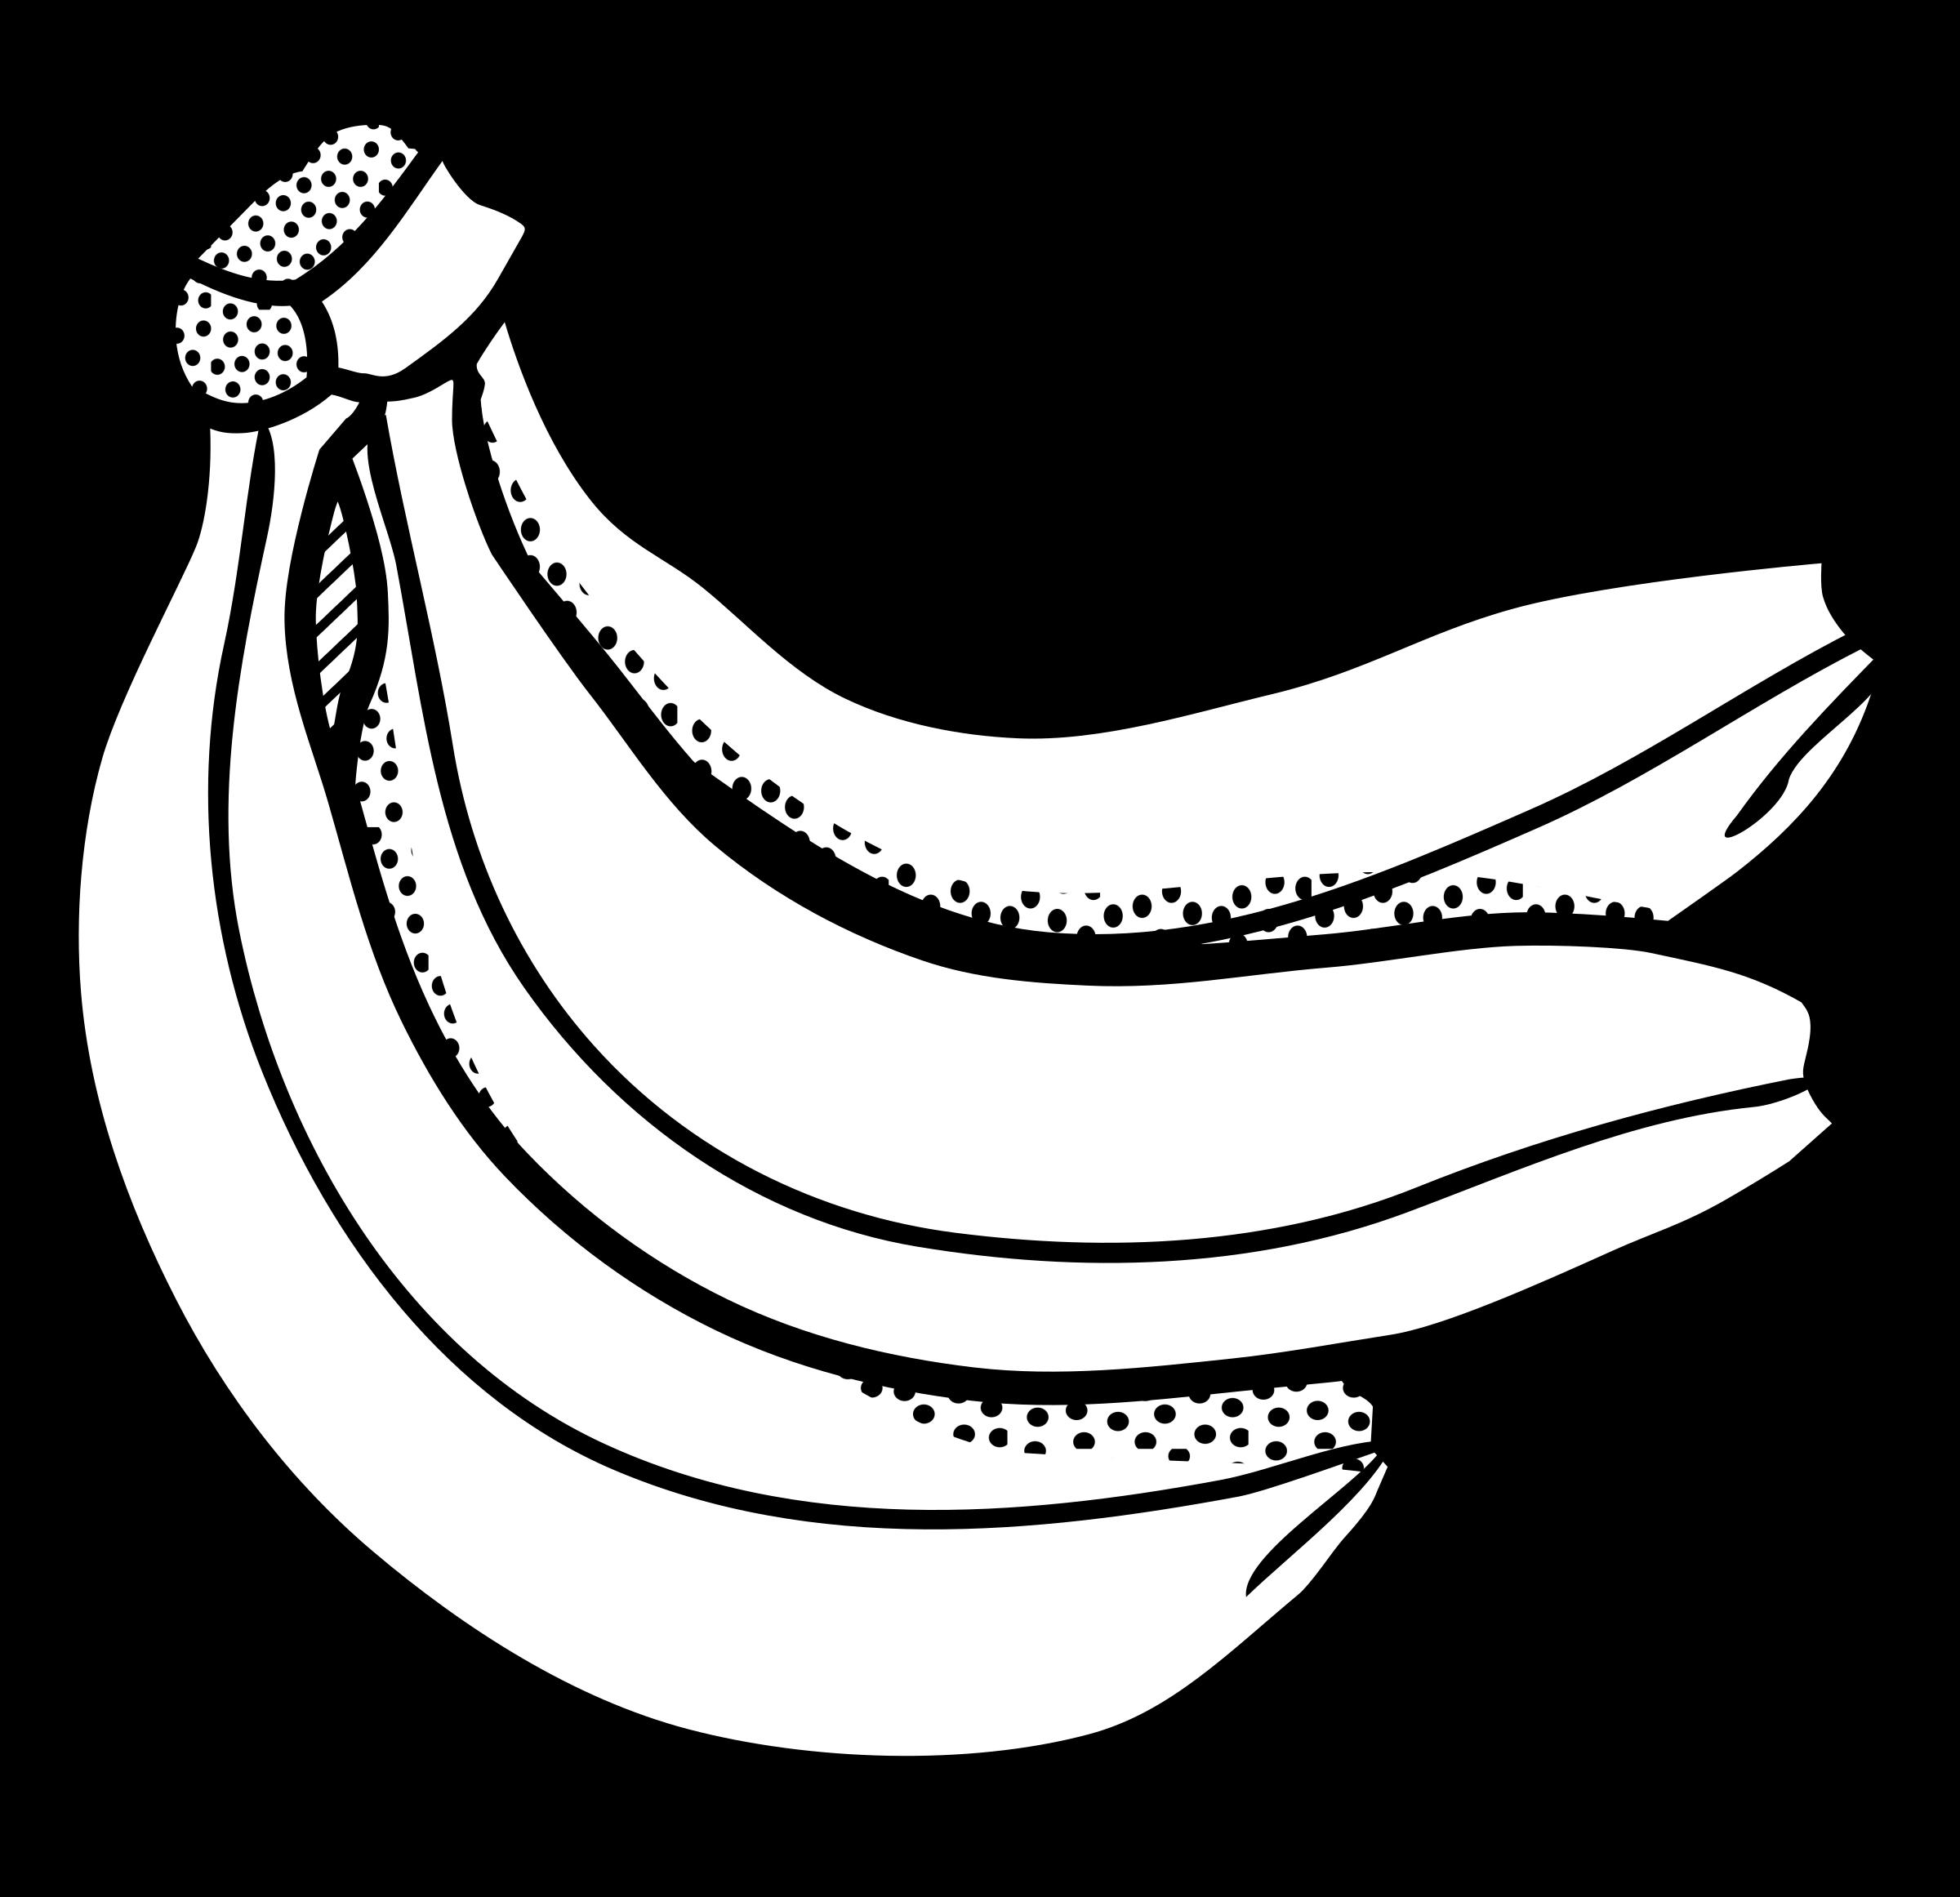 image freeuse library Banana outline at getdrawings. Bananas drawing easy